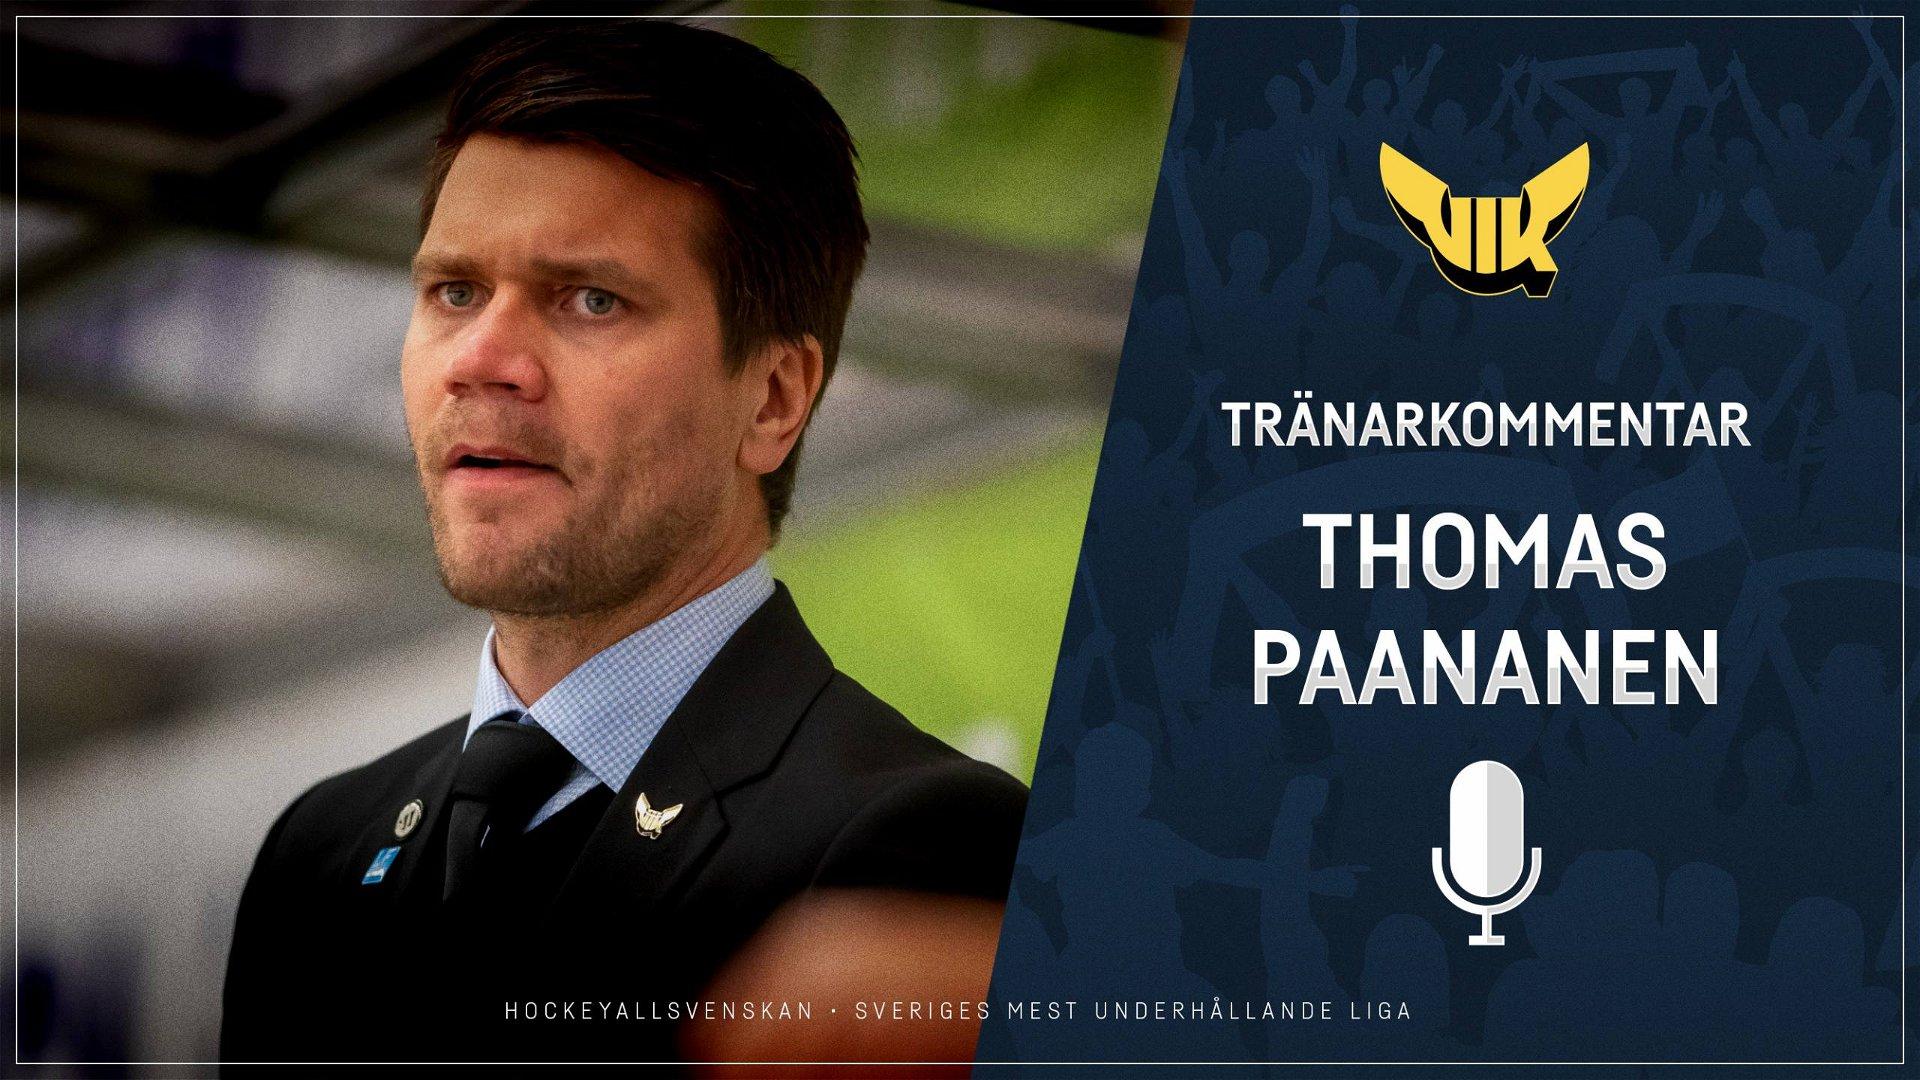 2021-01-26 Segerintervju: Thomas Paananen